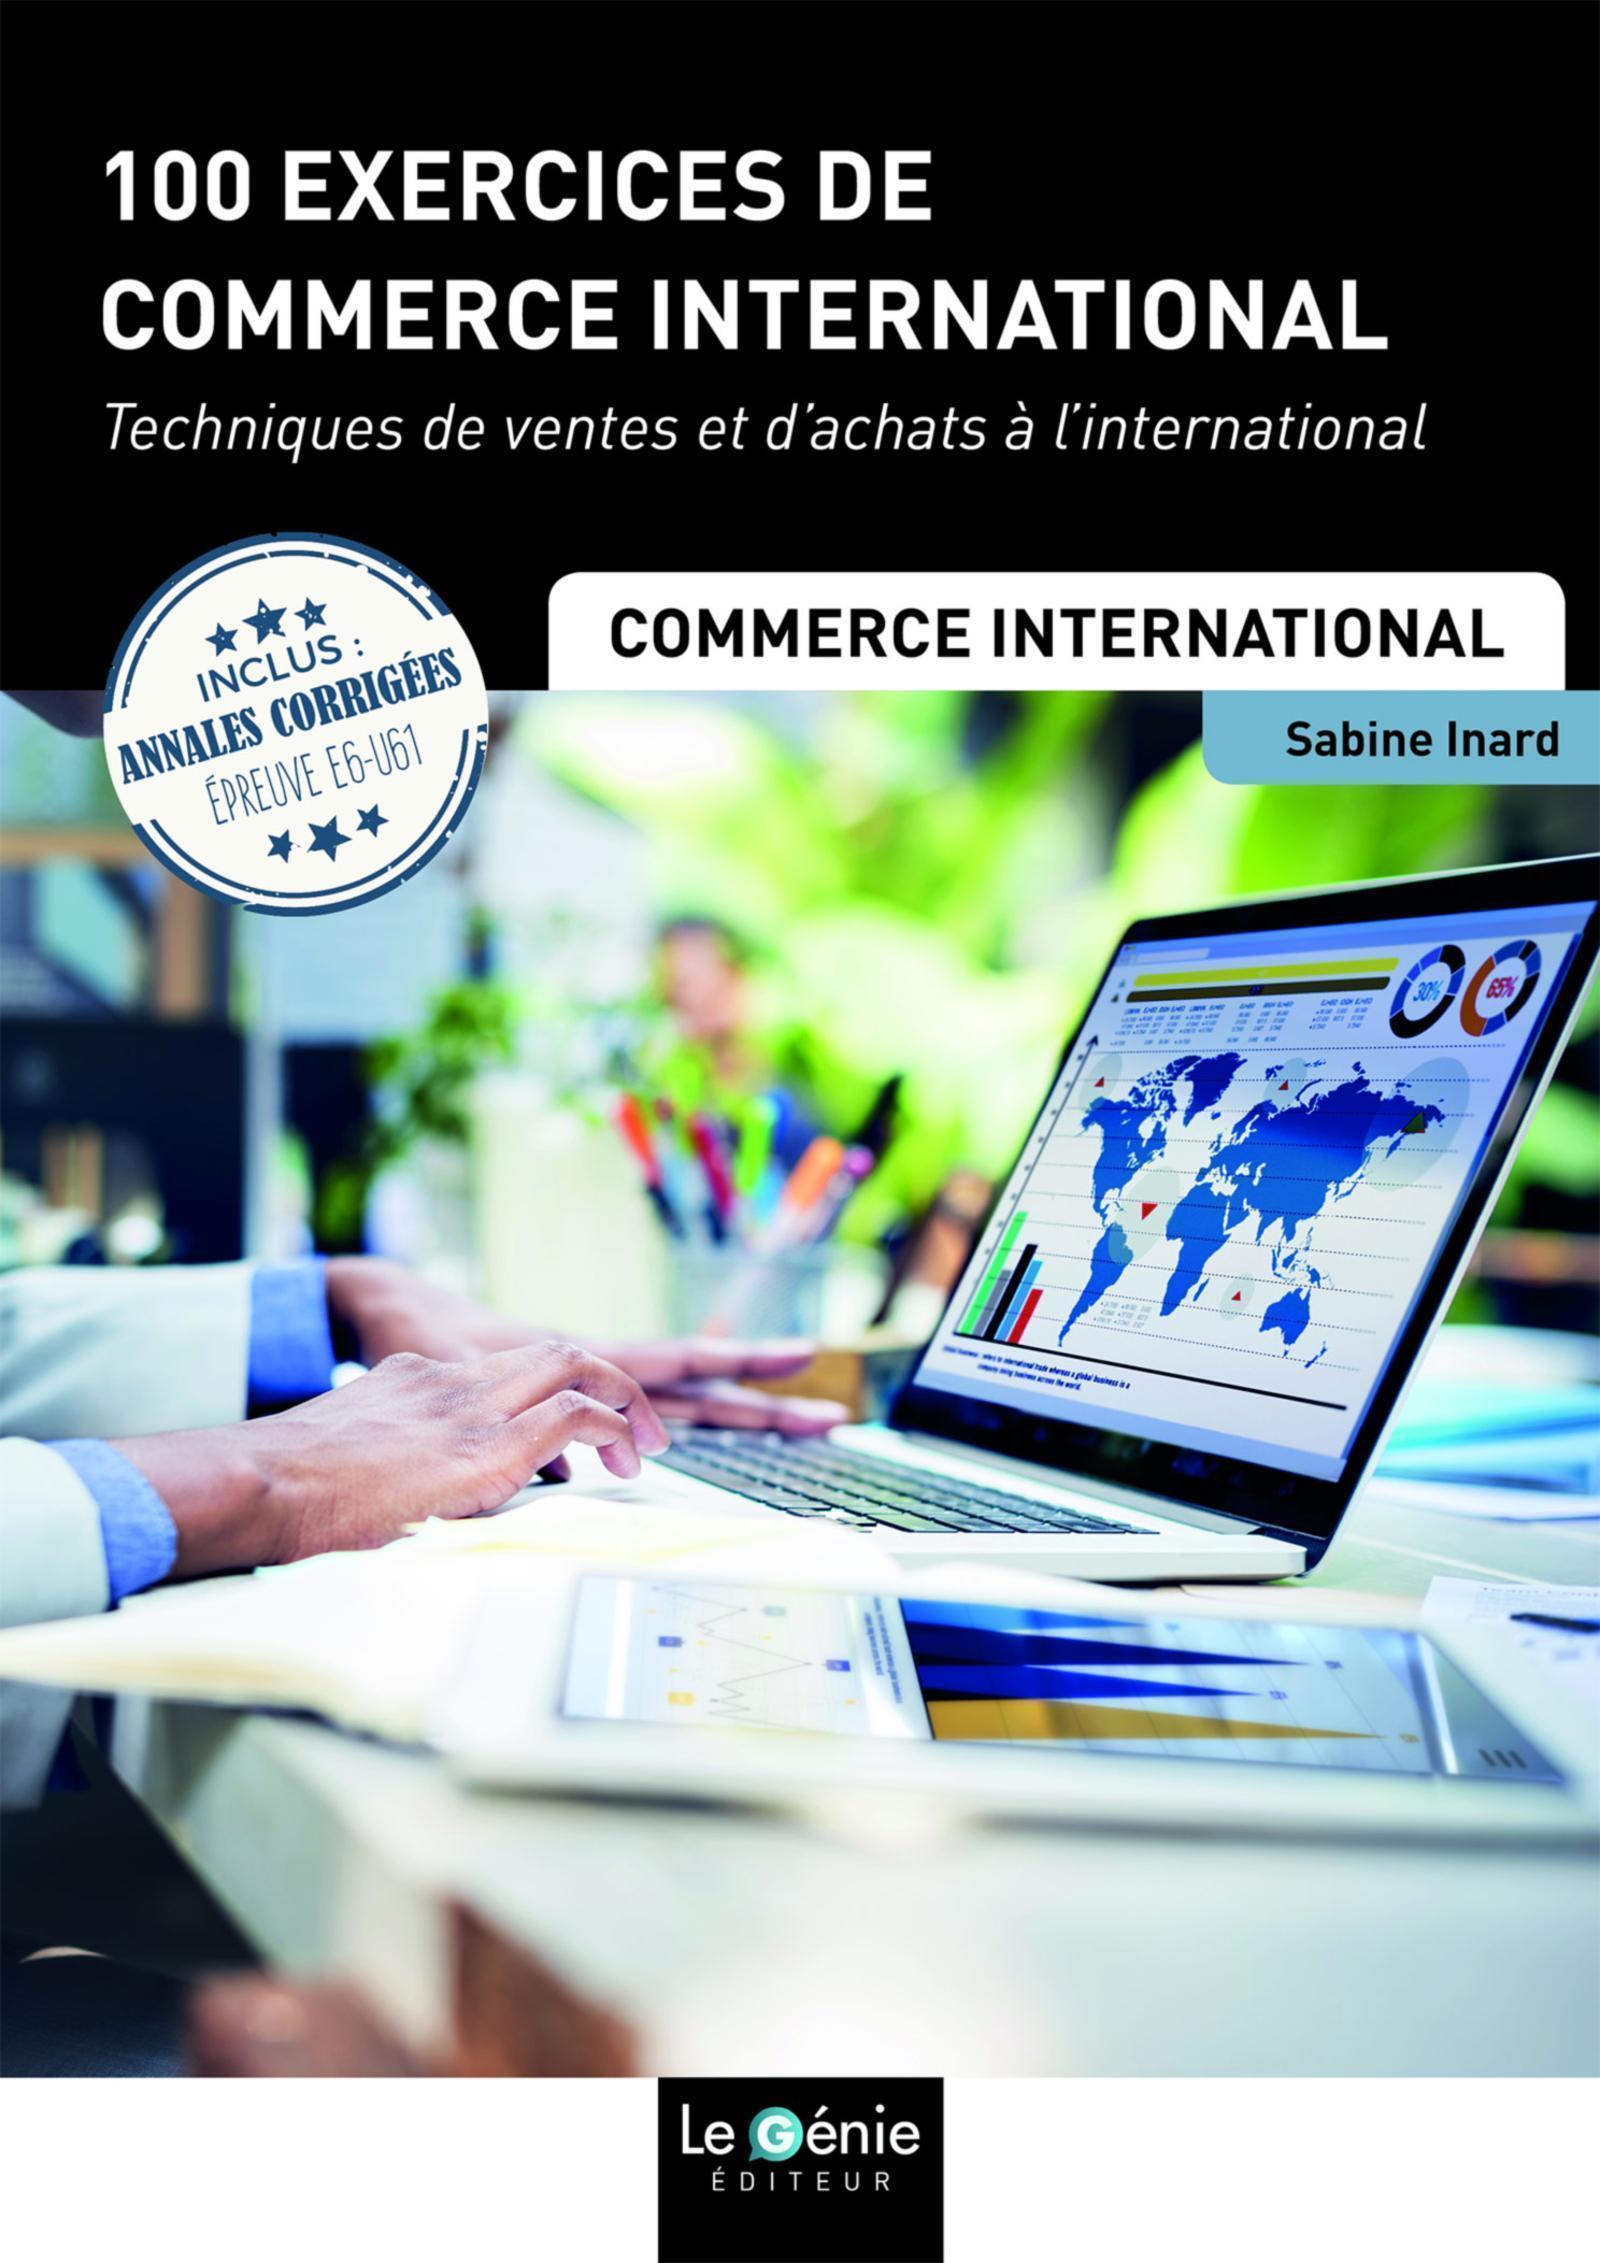 100 EXERCICES DE COMMERCE INTERNATIONAL